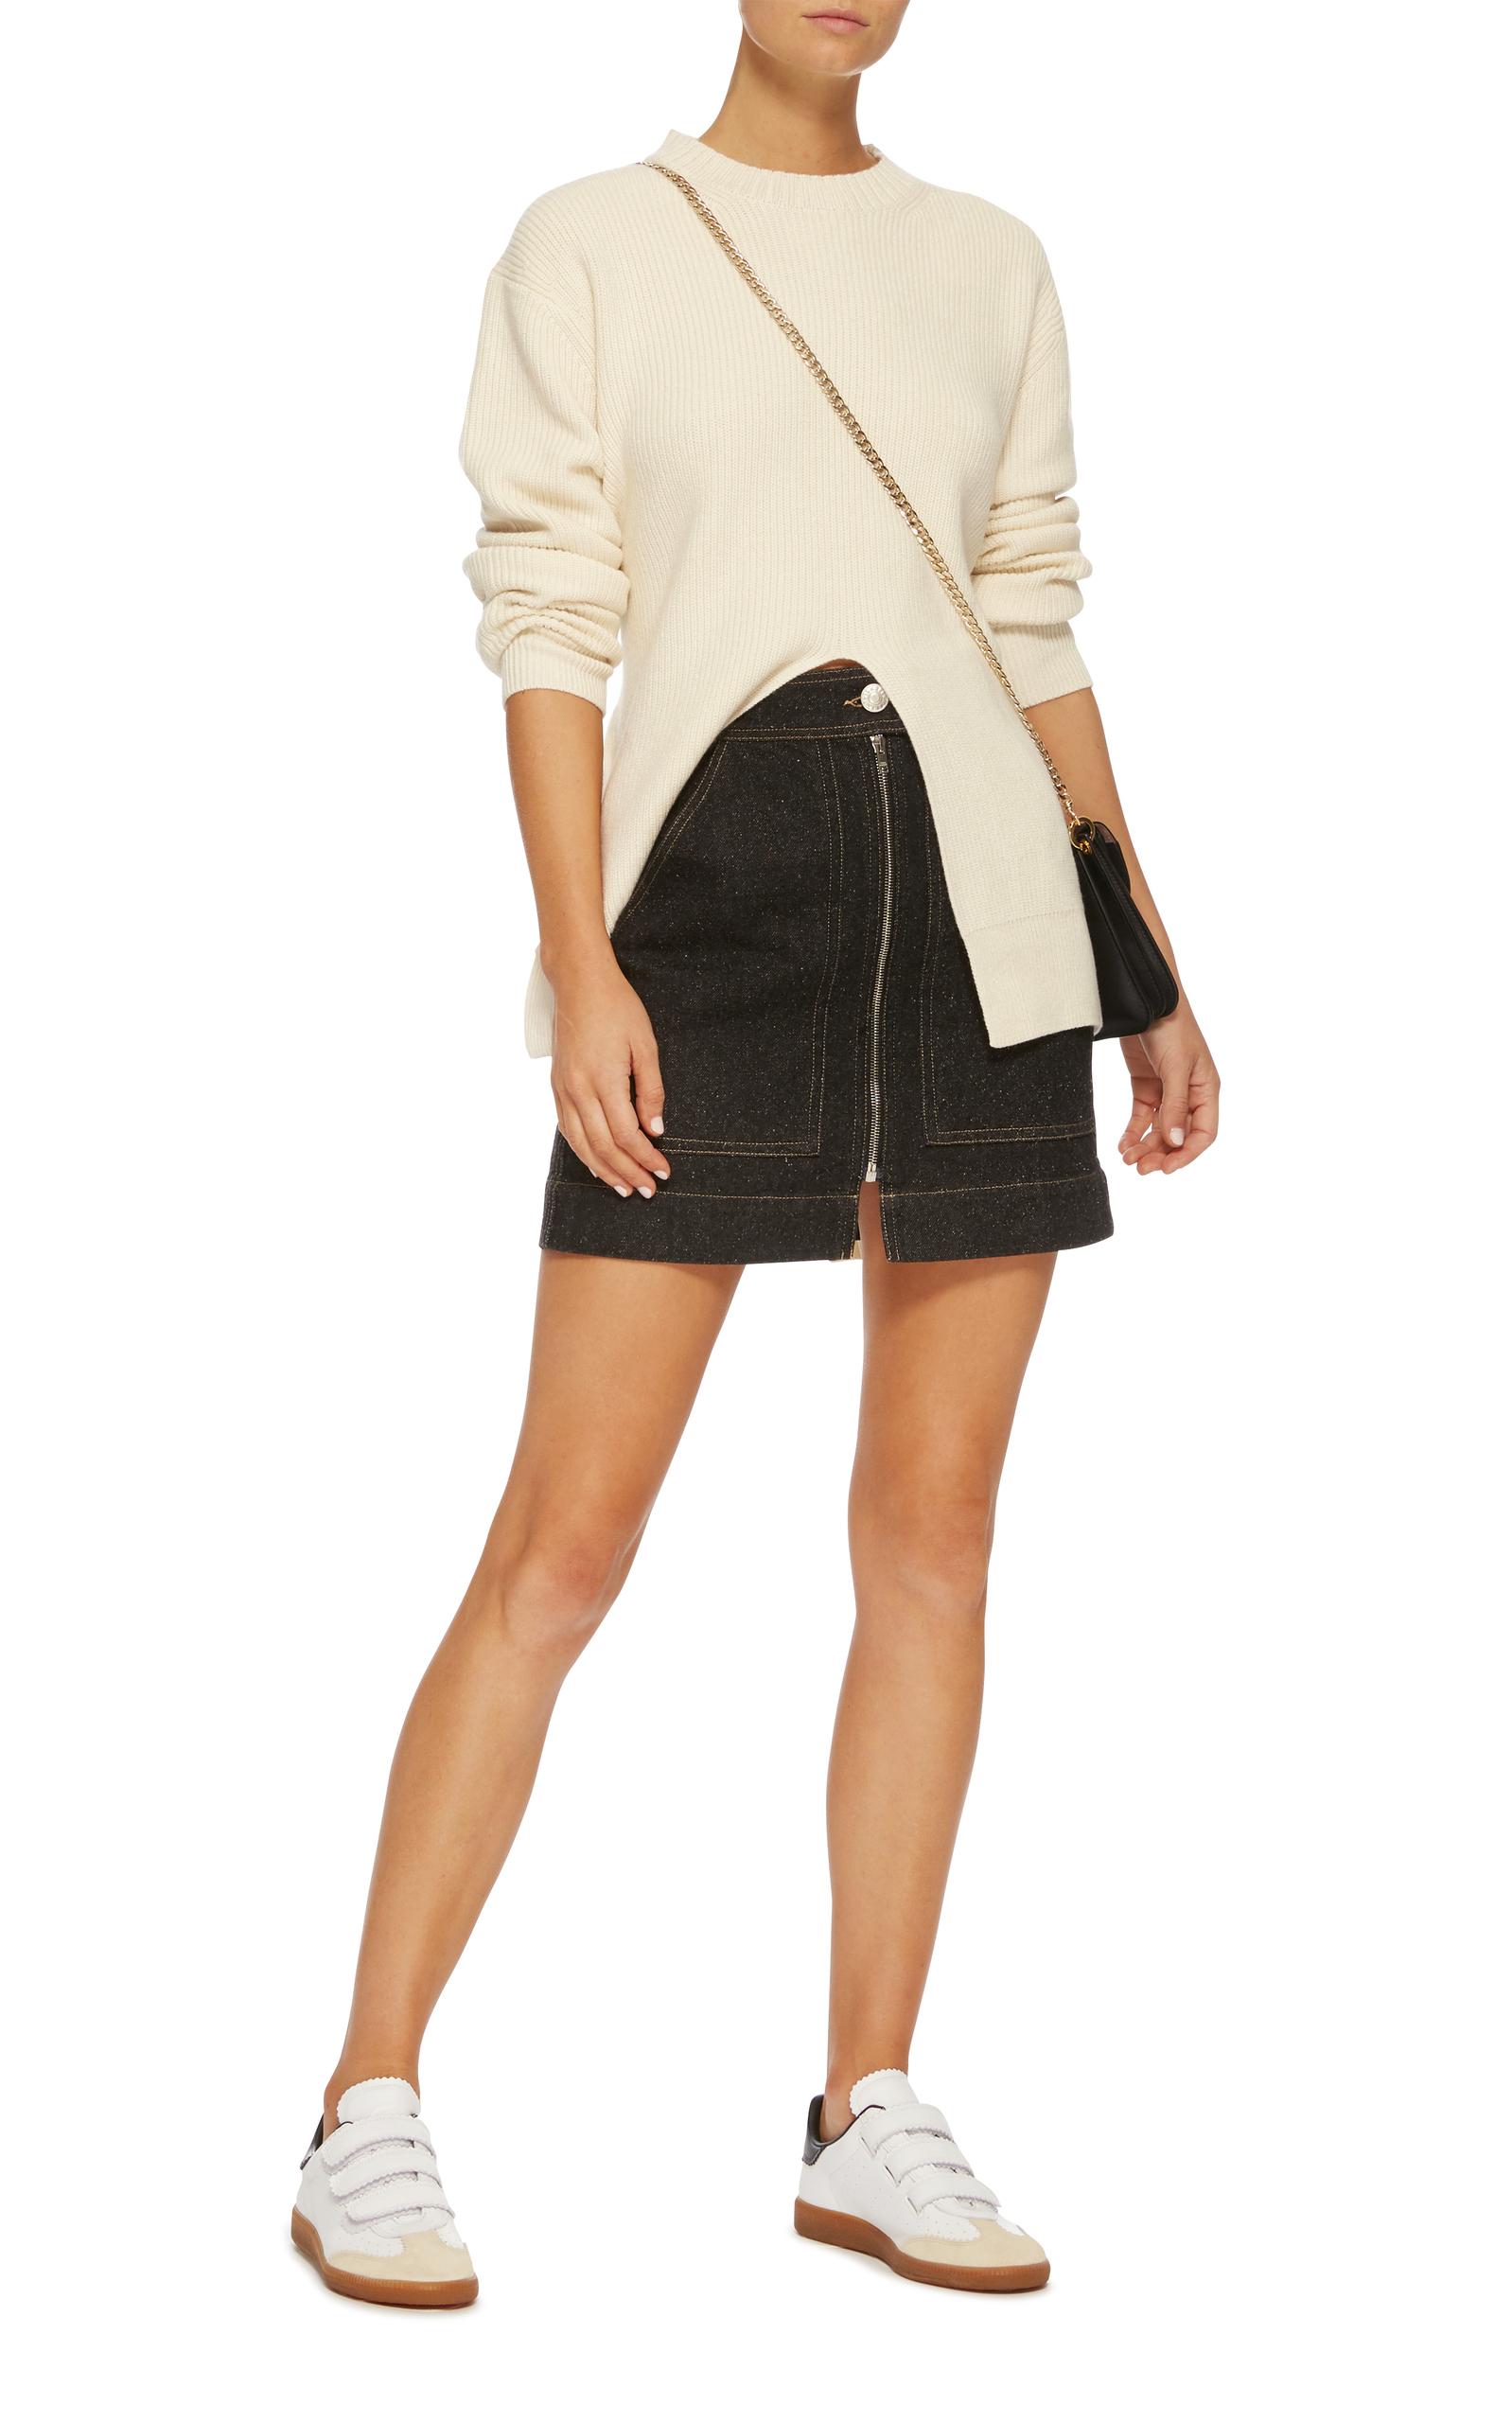 f17adb0741 Isabel MarantBeth Stripe Leather Sneakers. CLOSE. Loading. Loading